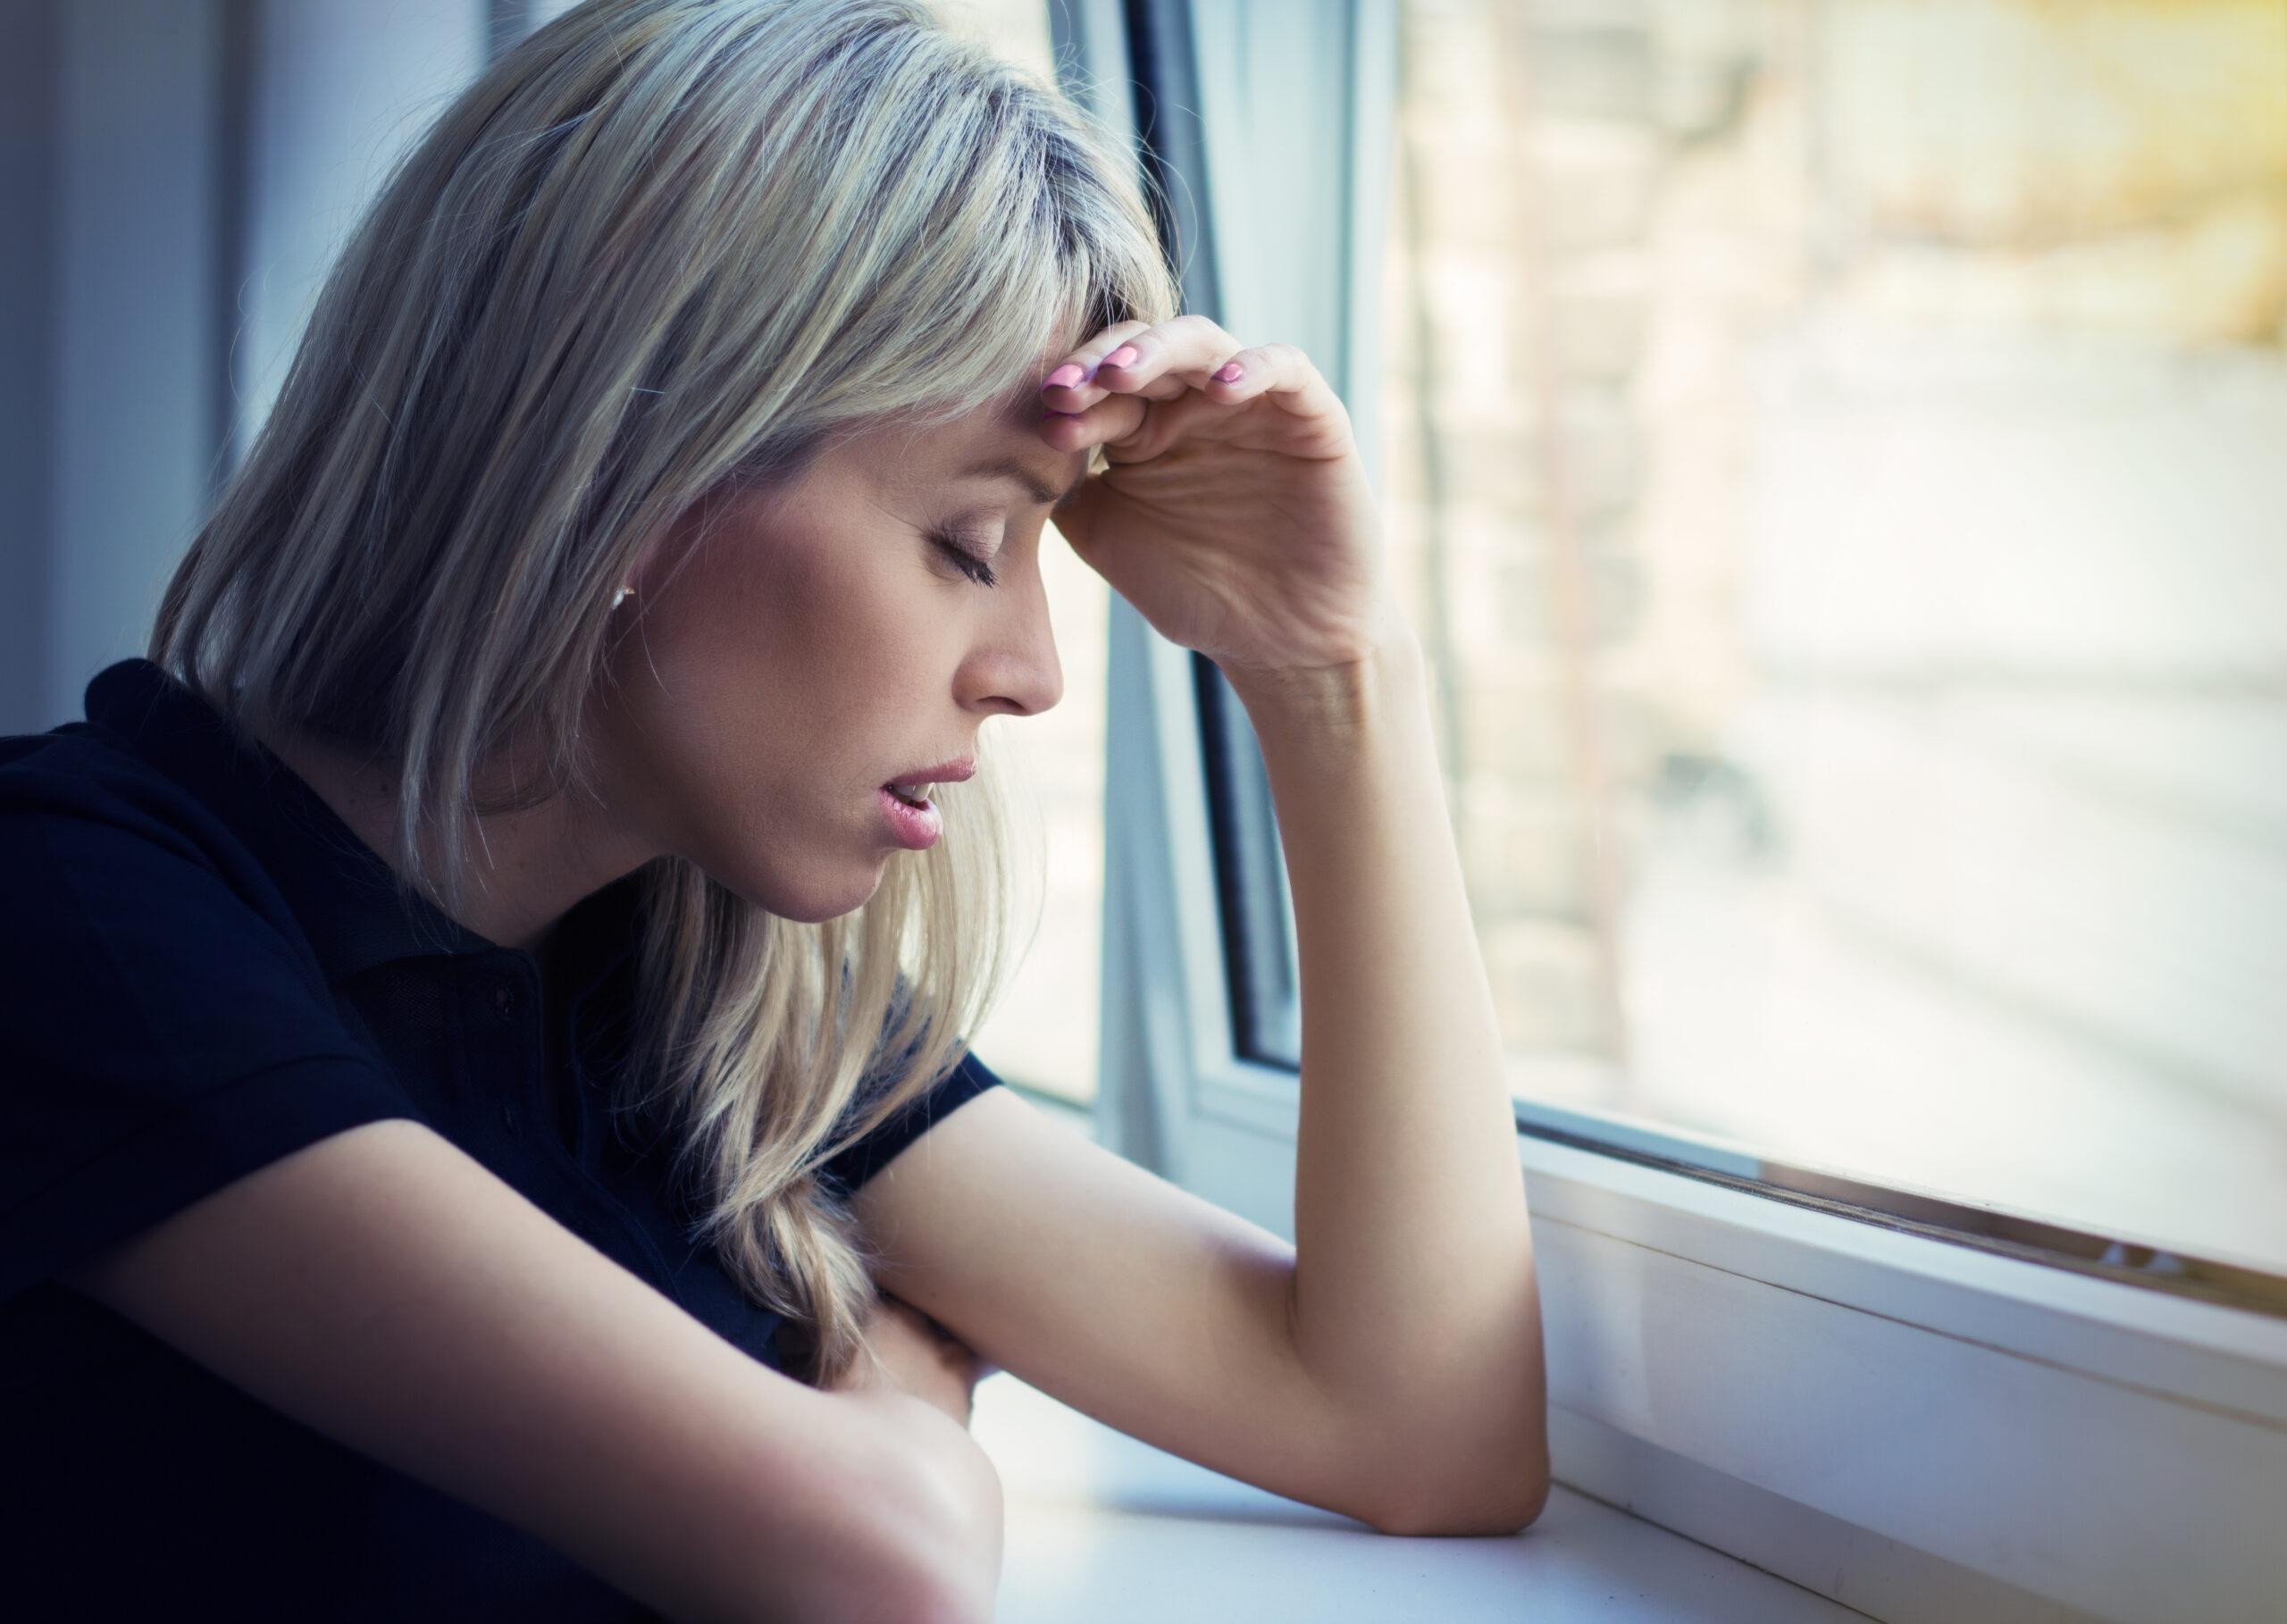 Severe Headaches and Anxiety